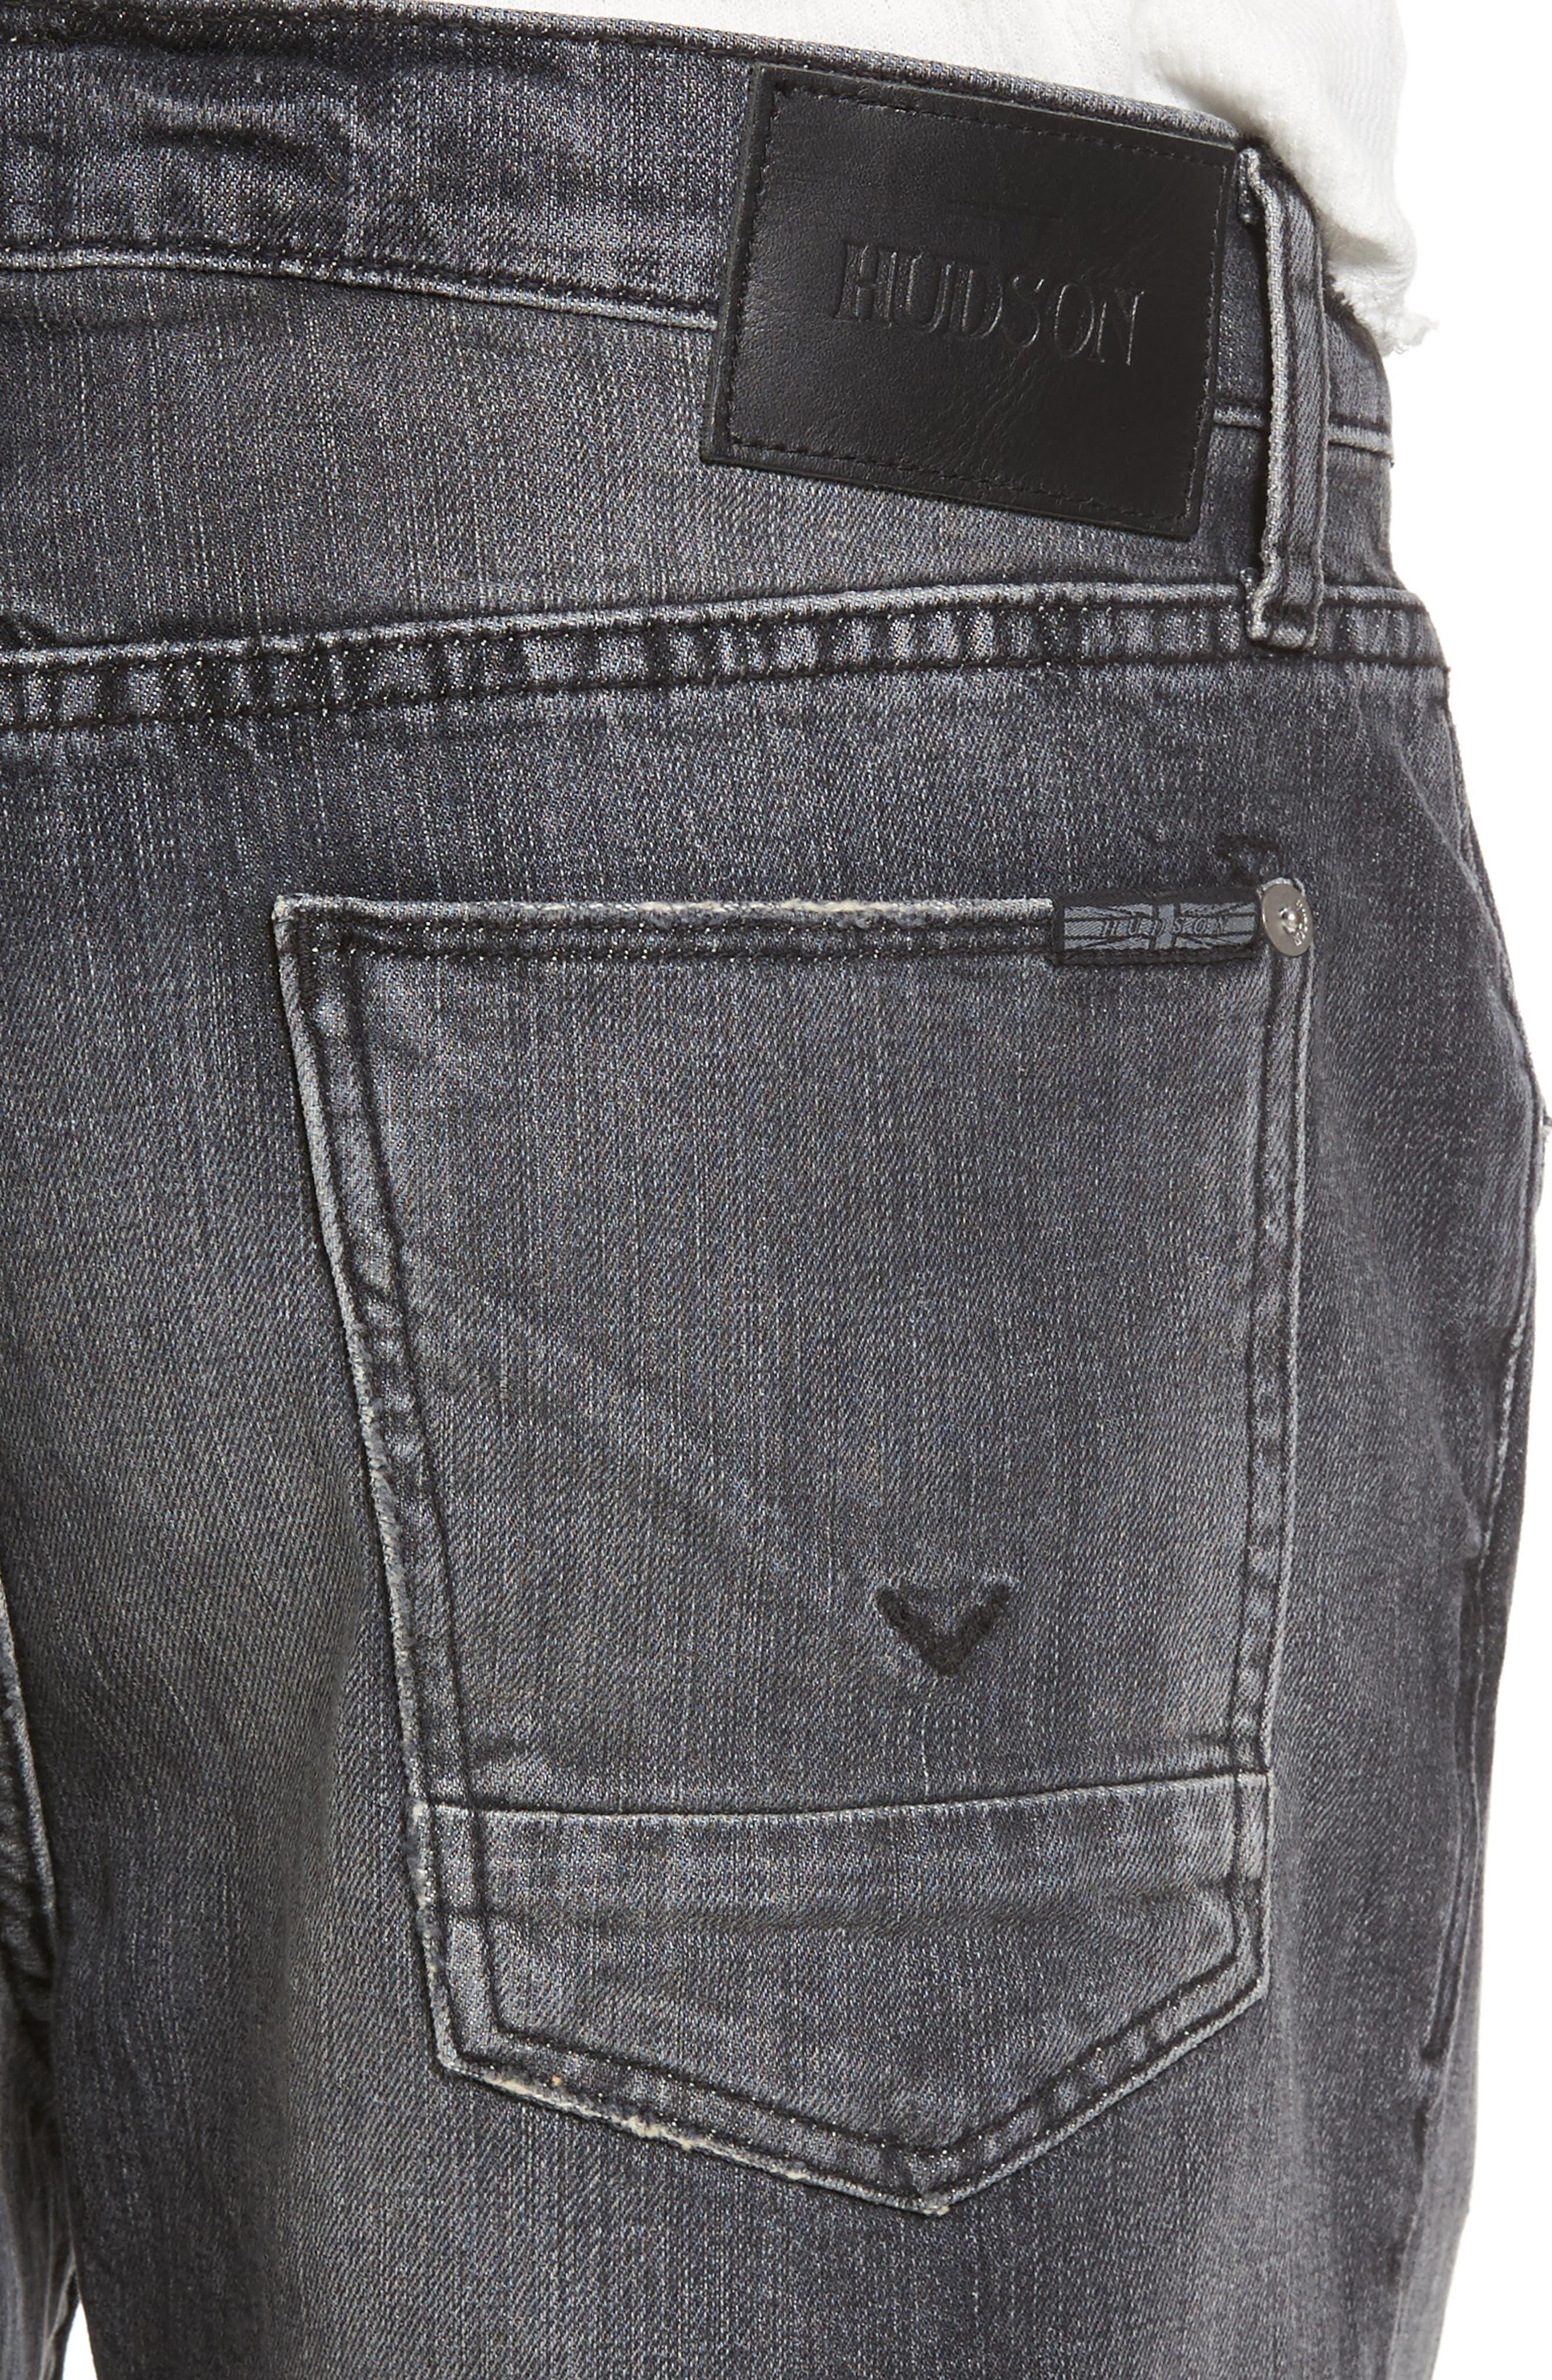 Axl Skinny Fit Jeans,                             Alternate thumbnail 4, color,                             Venture